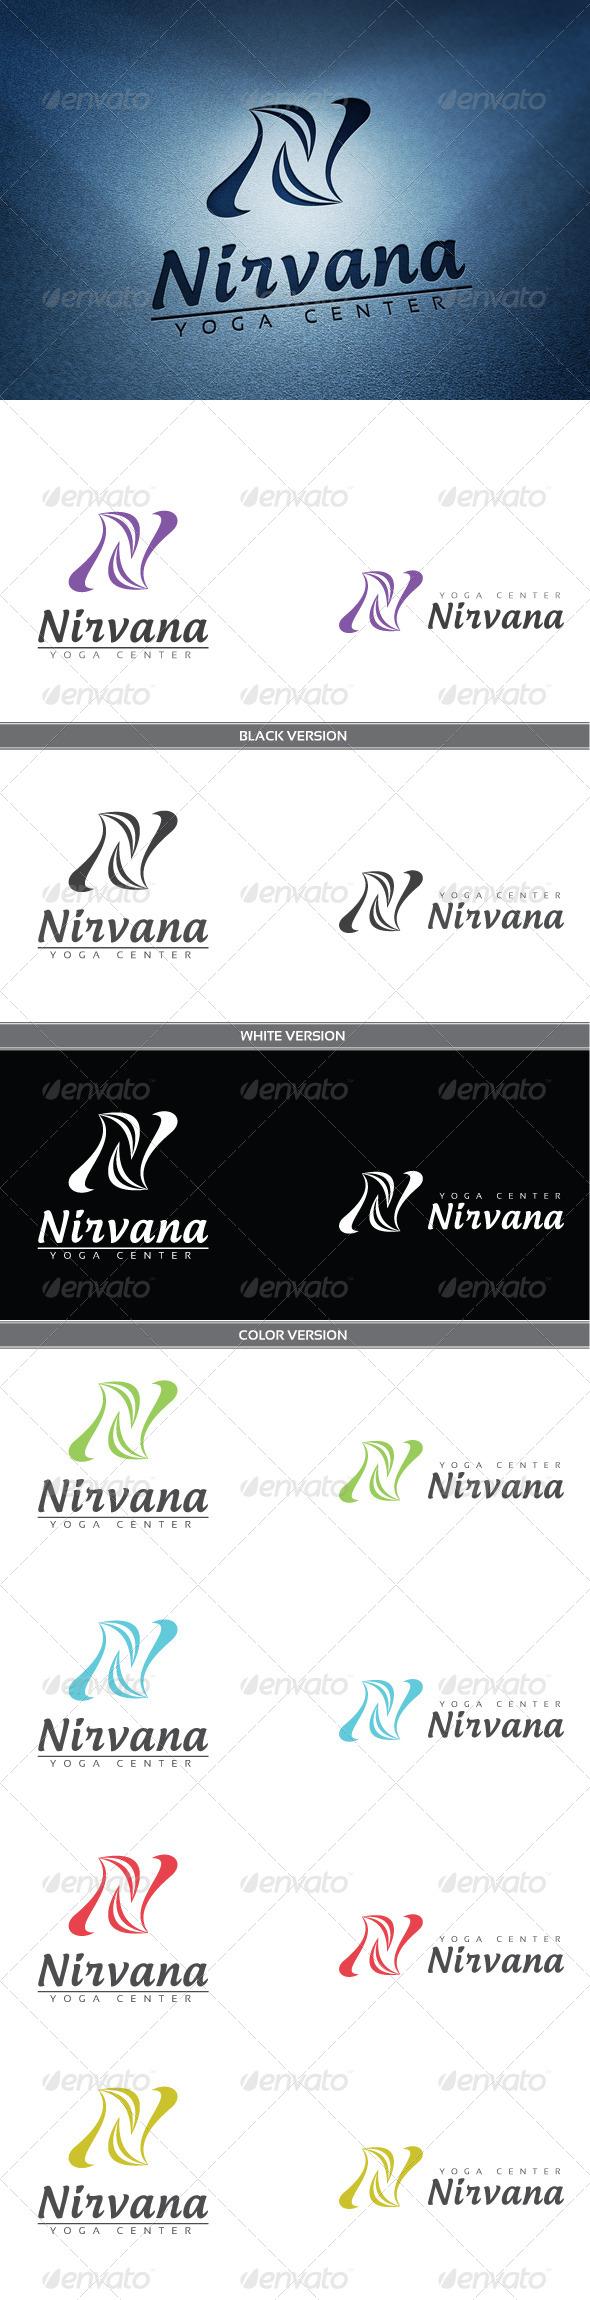 GraphicRiver Nirvana 3763168